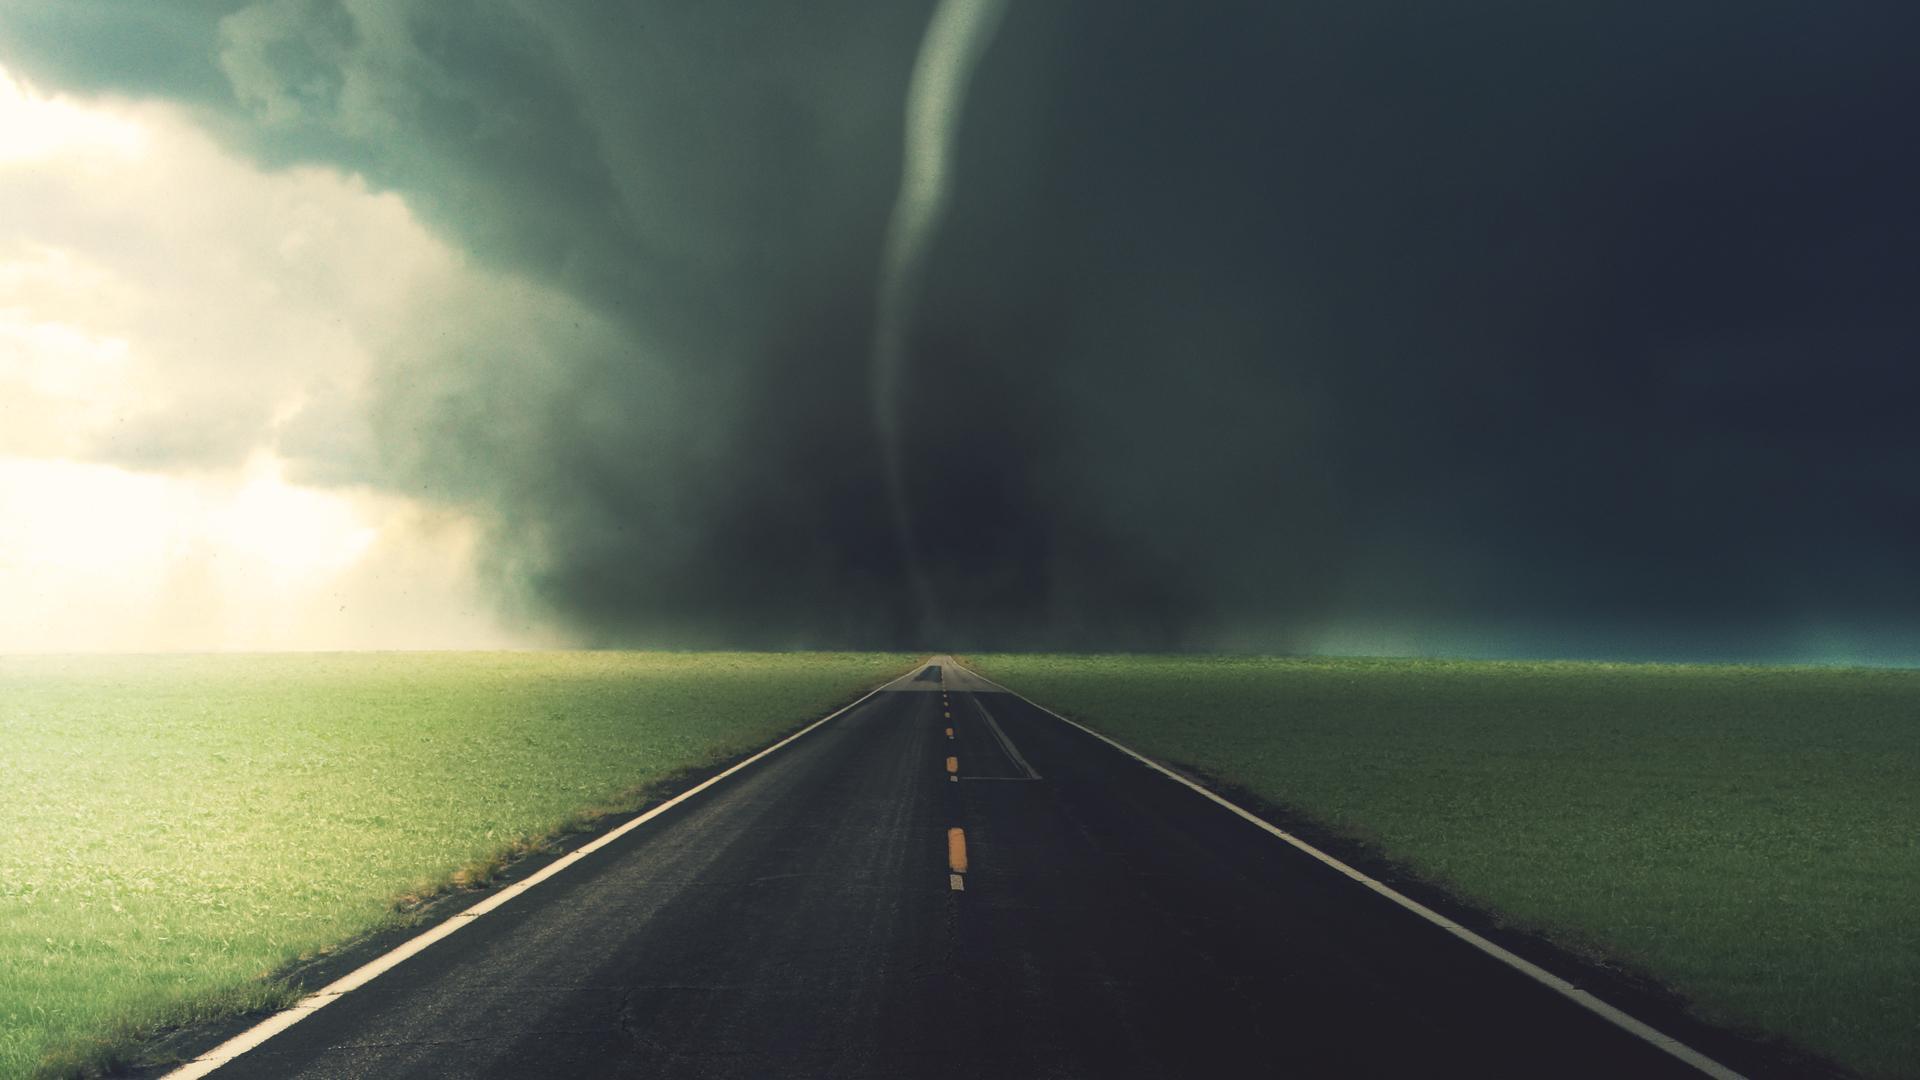 Best Desktop Backgrounds Tornado 1920x1080